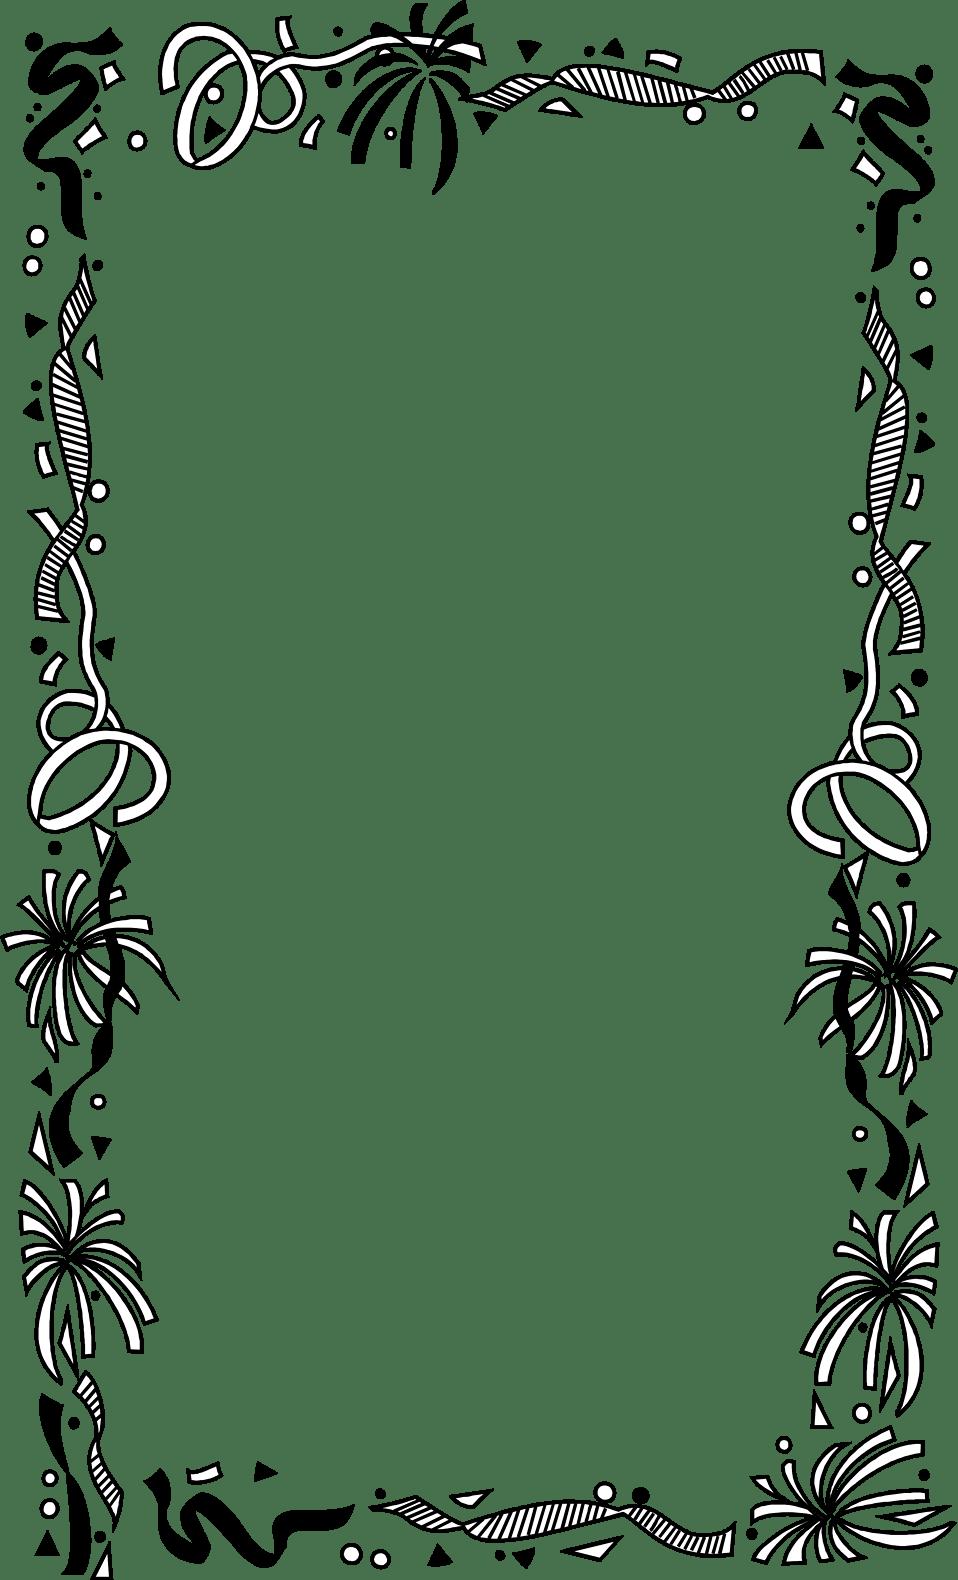 Confetti Free Stock Photo Illustration Of A Blank